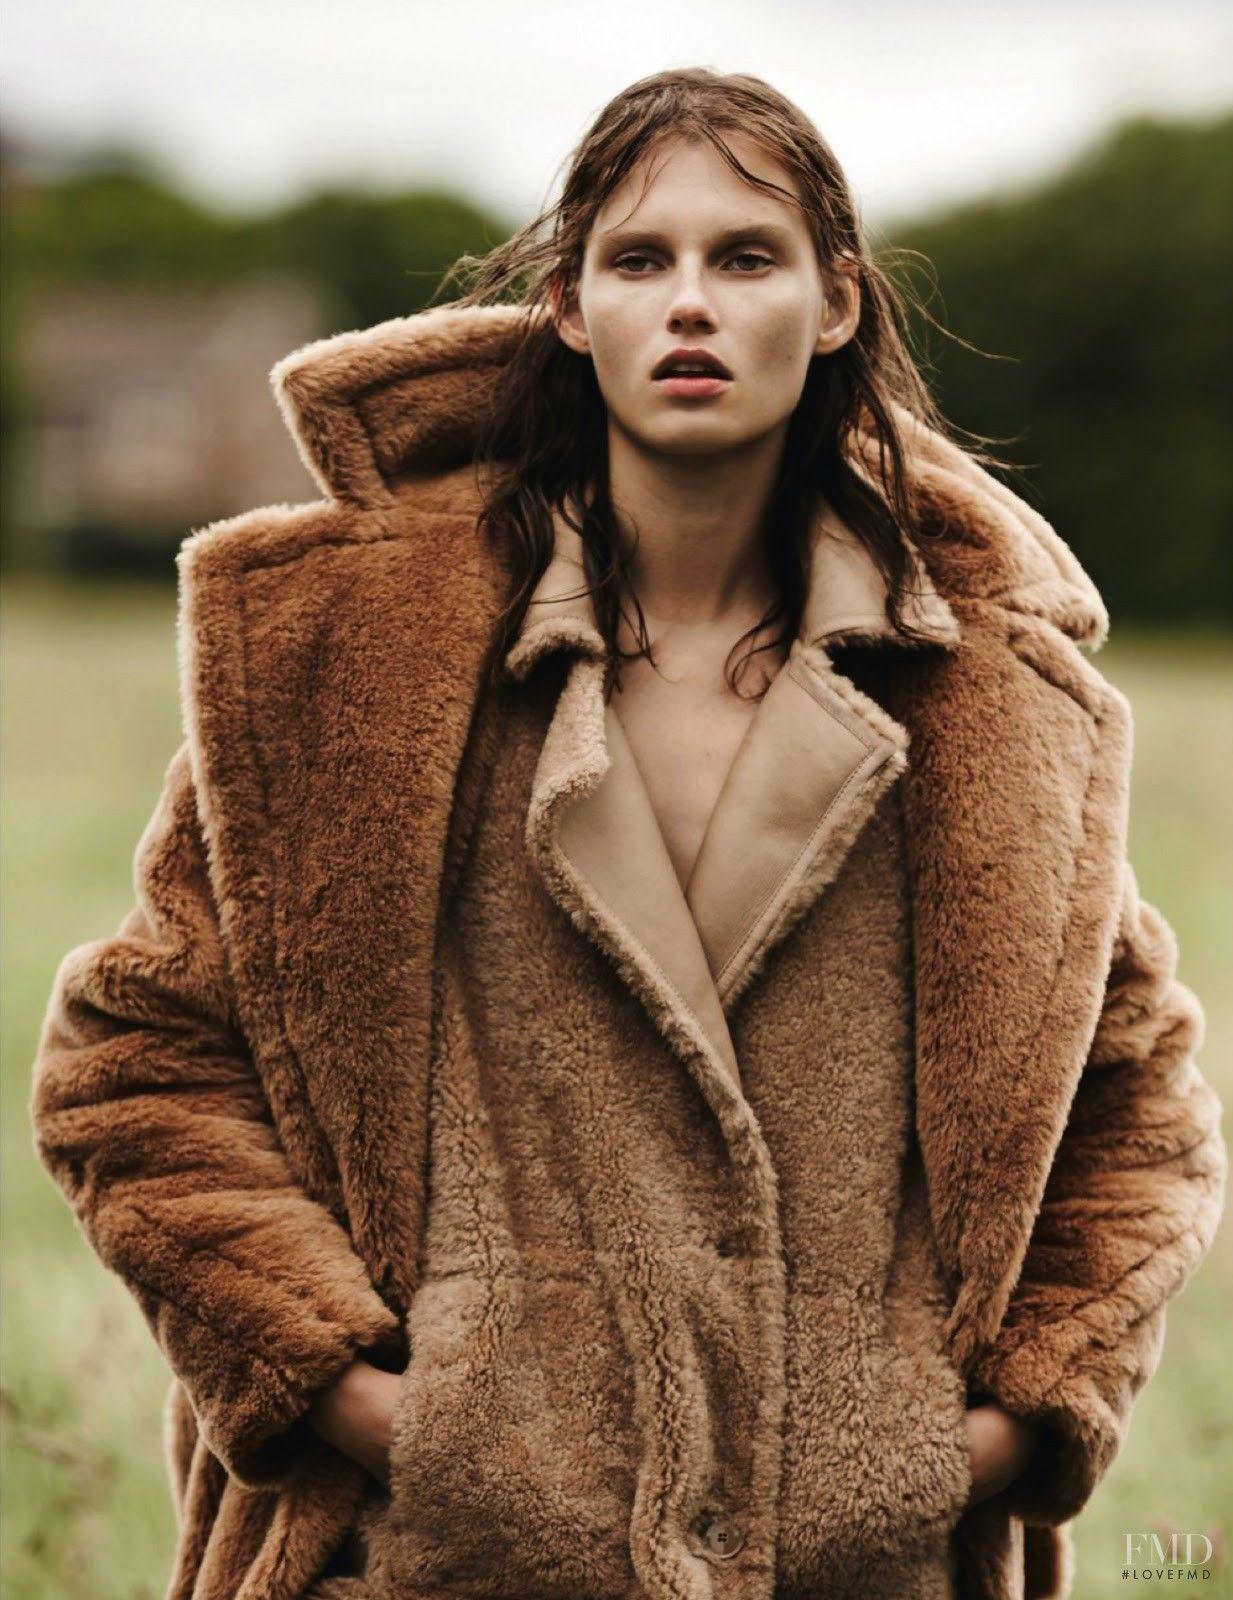 http://images.fashionmodeldirectory.com/images/editorials/9921/9921-1026-99463-66499-fullsize.jpg